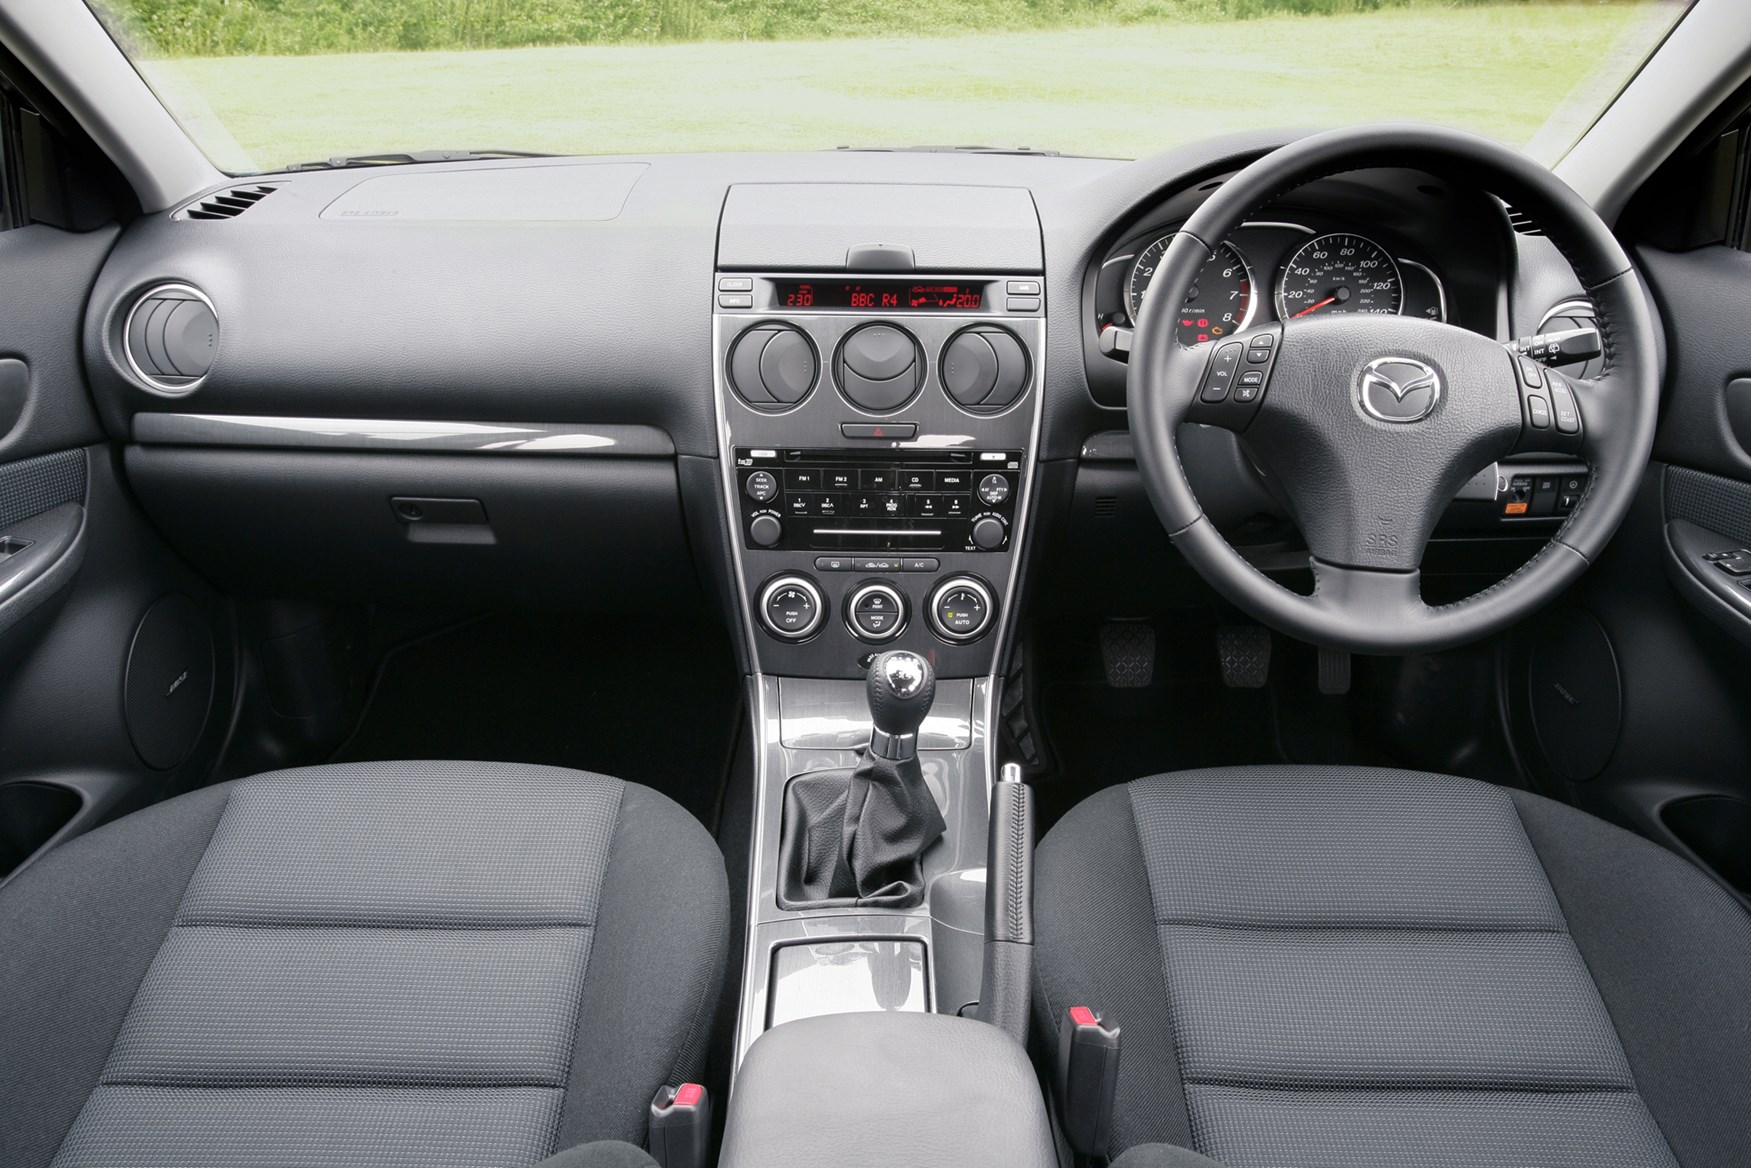 Mazda 6 Hatchback Review 2002 2007 Parkers